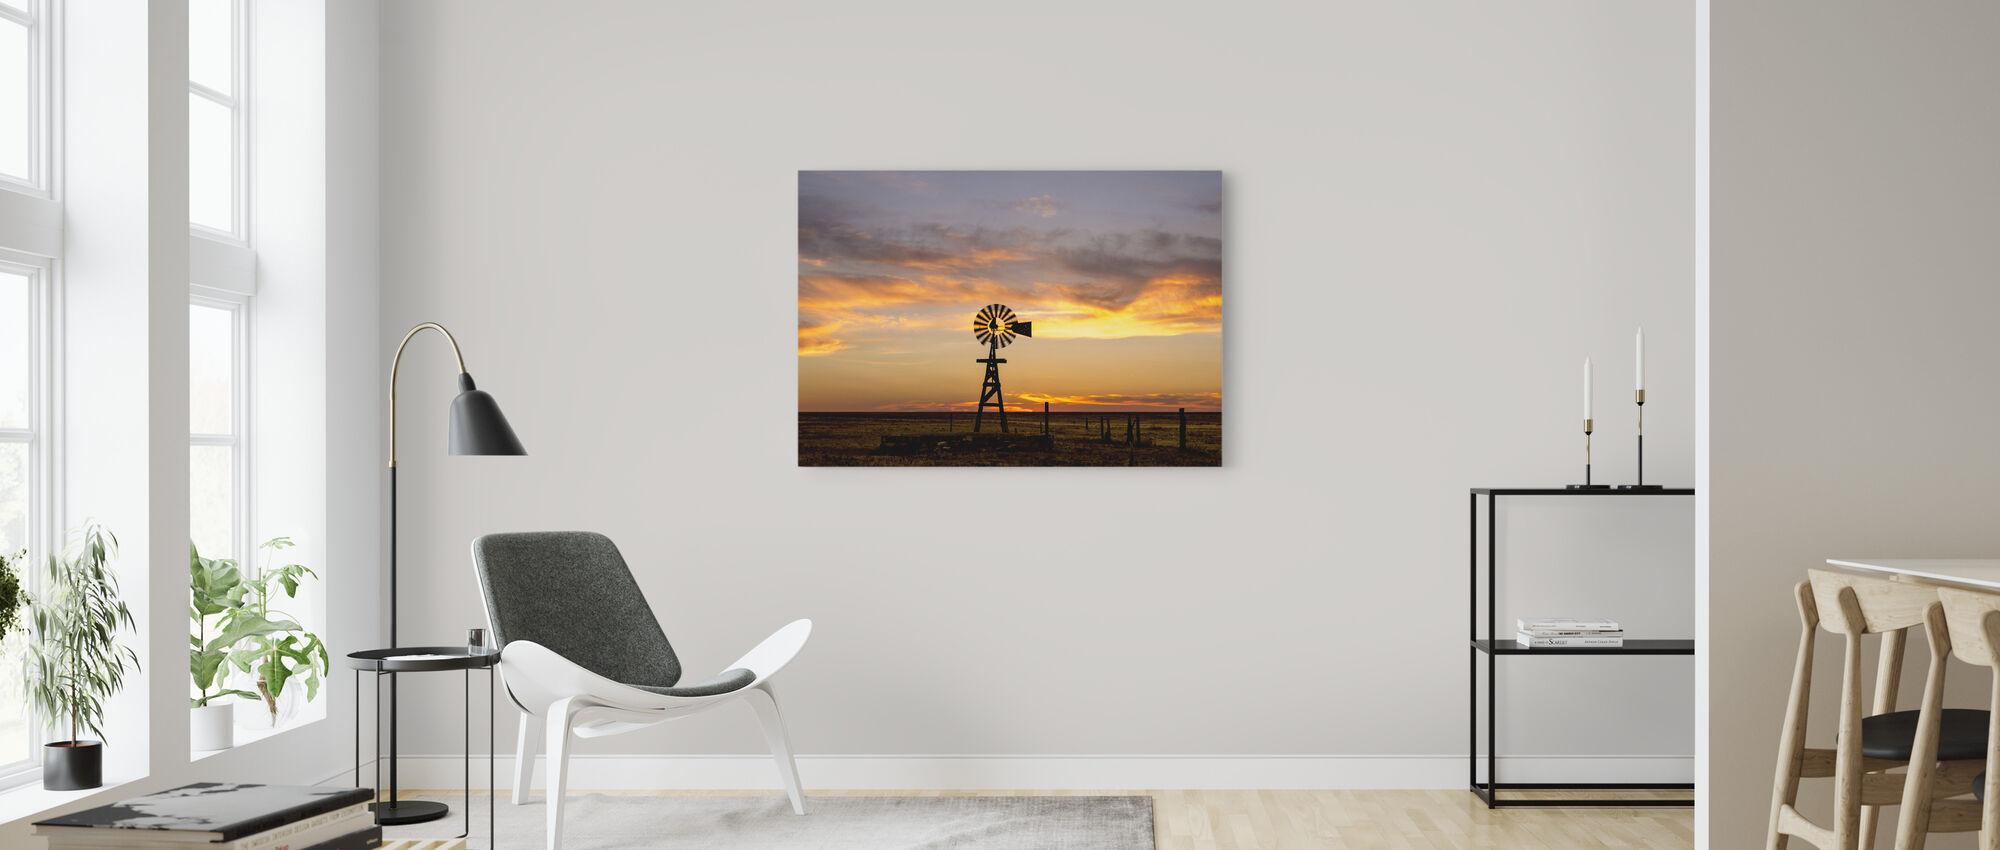 Plains Windmill - Canvas print - Living Room